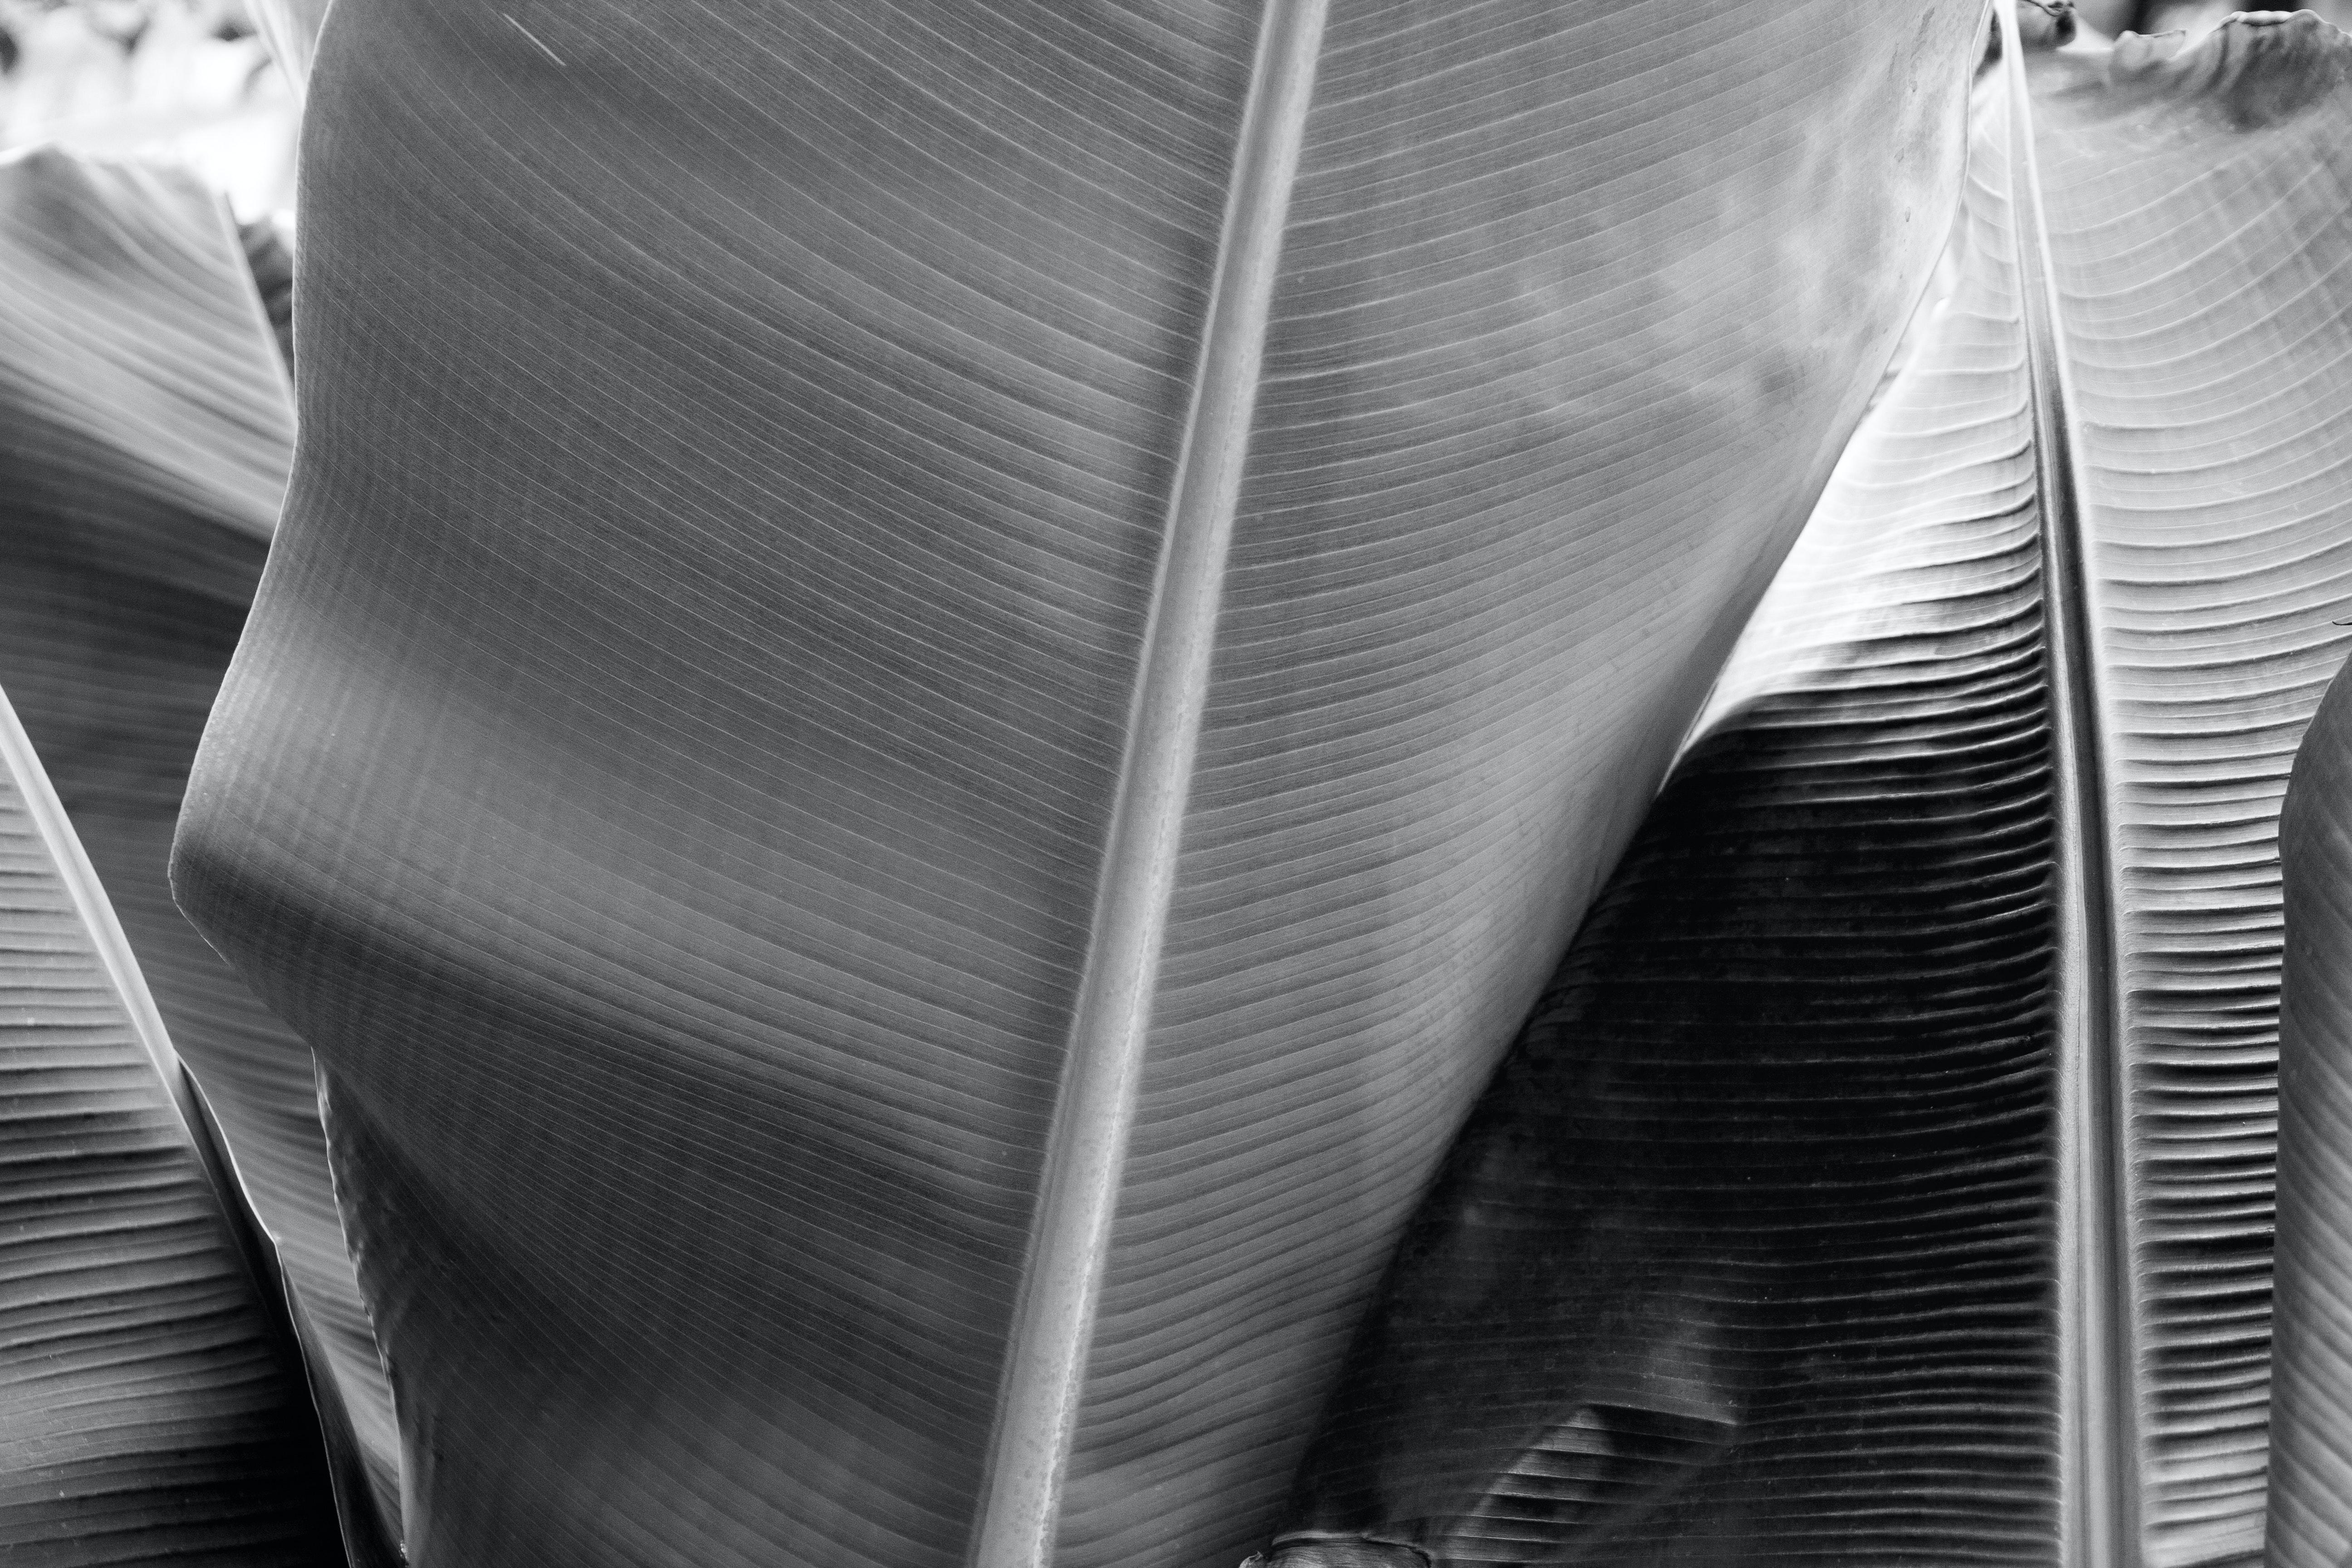 Free stock photo of black and white botanical garden exotic plants